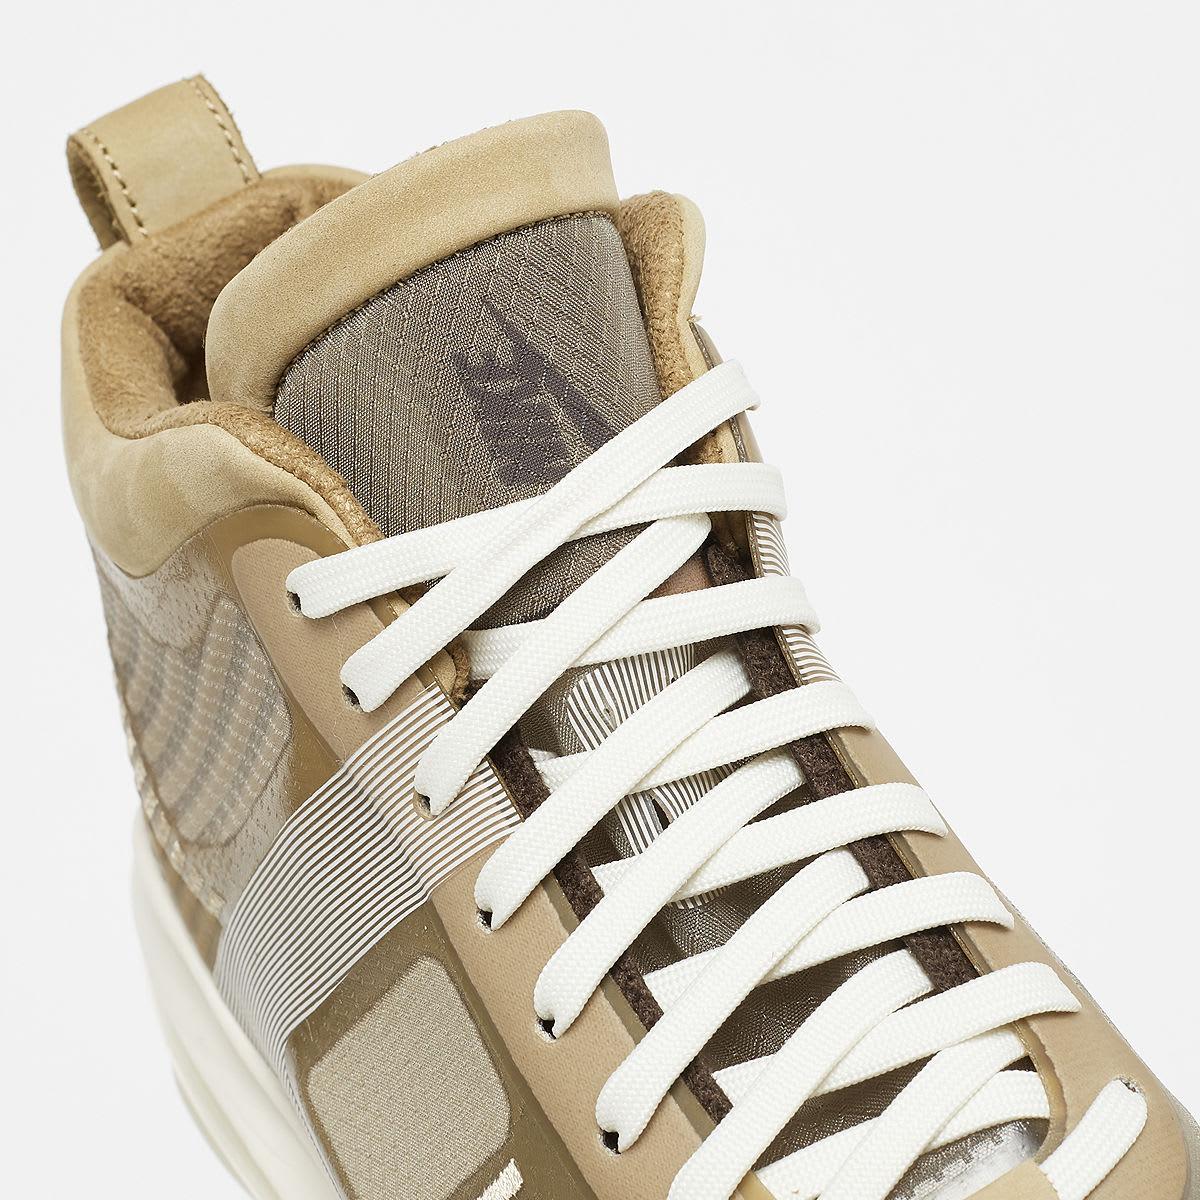 John Elliott x Nike LeBron Icon QS 'Parachute Beige' AQ0114-200 (Tongue)